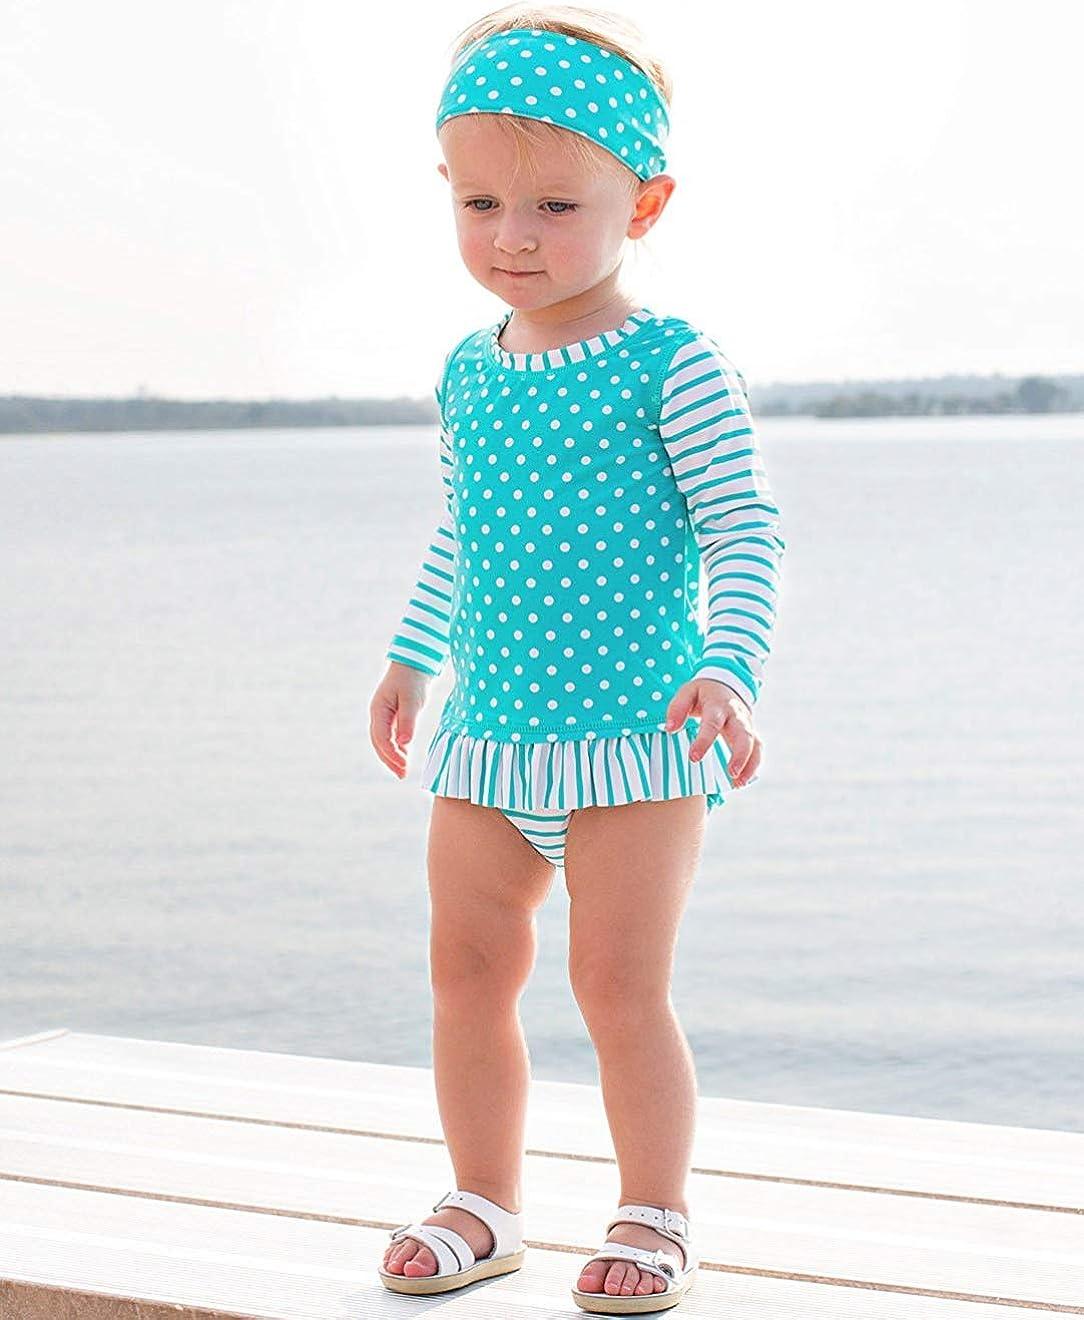 Sun Protection RuffleButts Girls Long Sleeve Rash Guard 2-Piece Swimsuit Set Stripes Polka with UPF 50